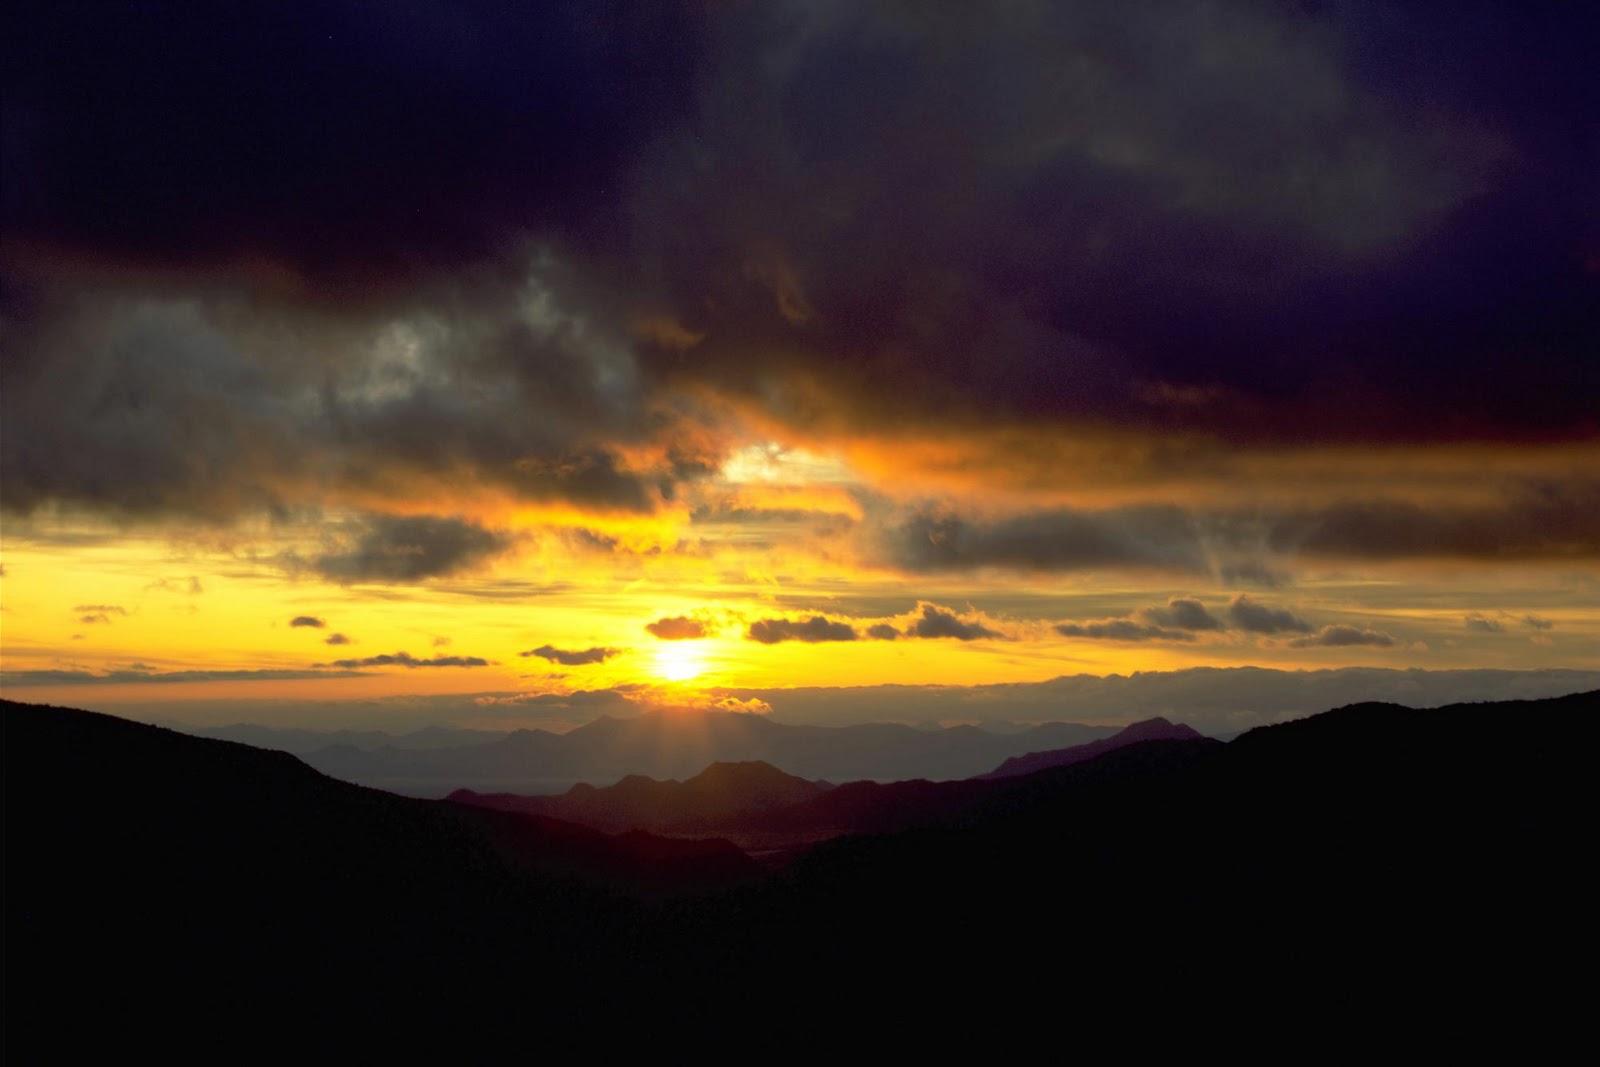 http://3.bp.blogspot.com/-UwmtPRYLWvg/TrZvALxUZZI/AAAAAAAAUpA/fV4j0uadgKs/s1600/Sunset+Wallpapers.jpg